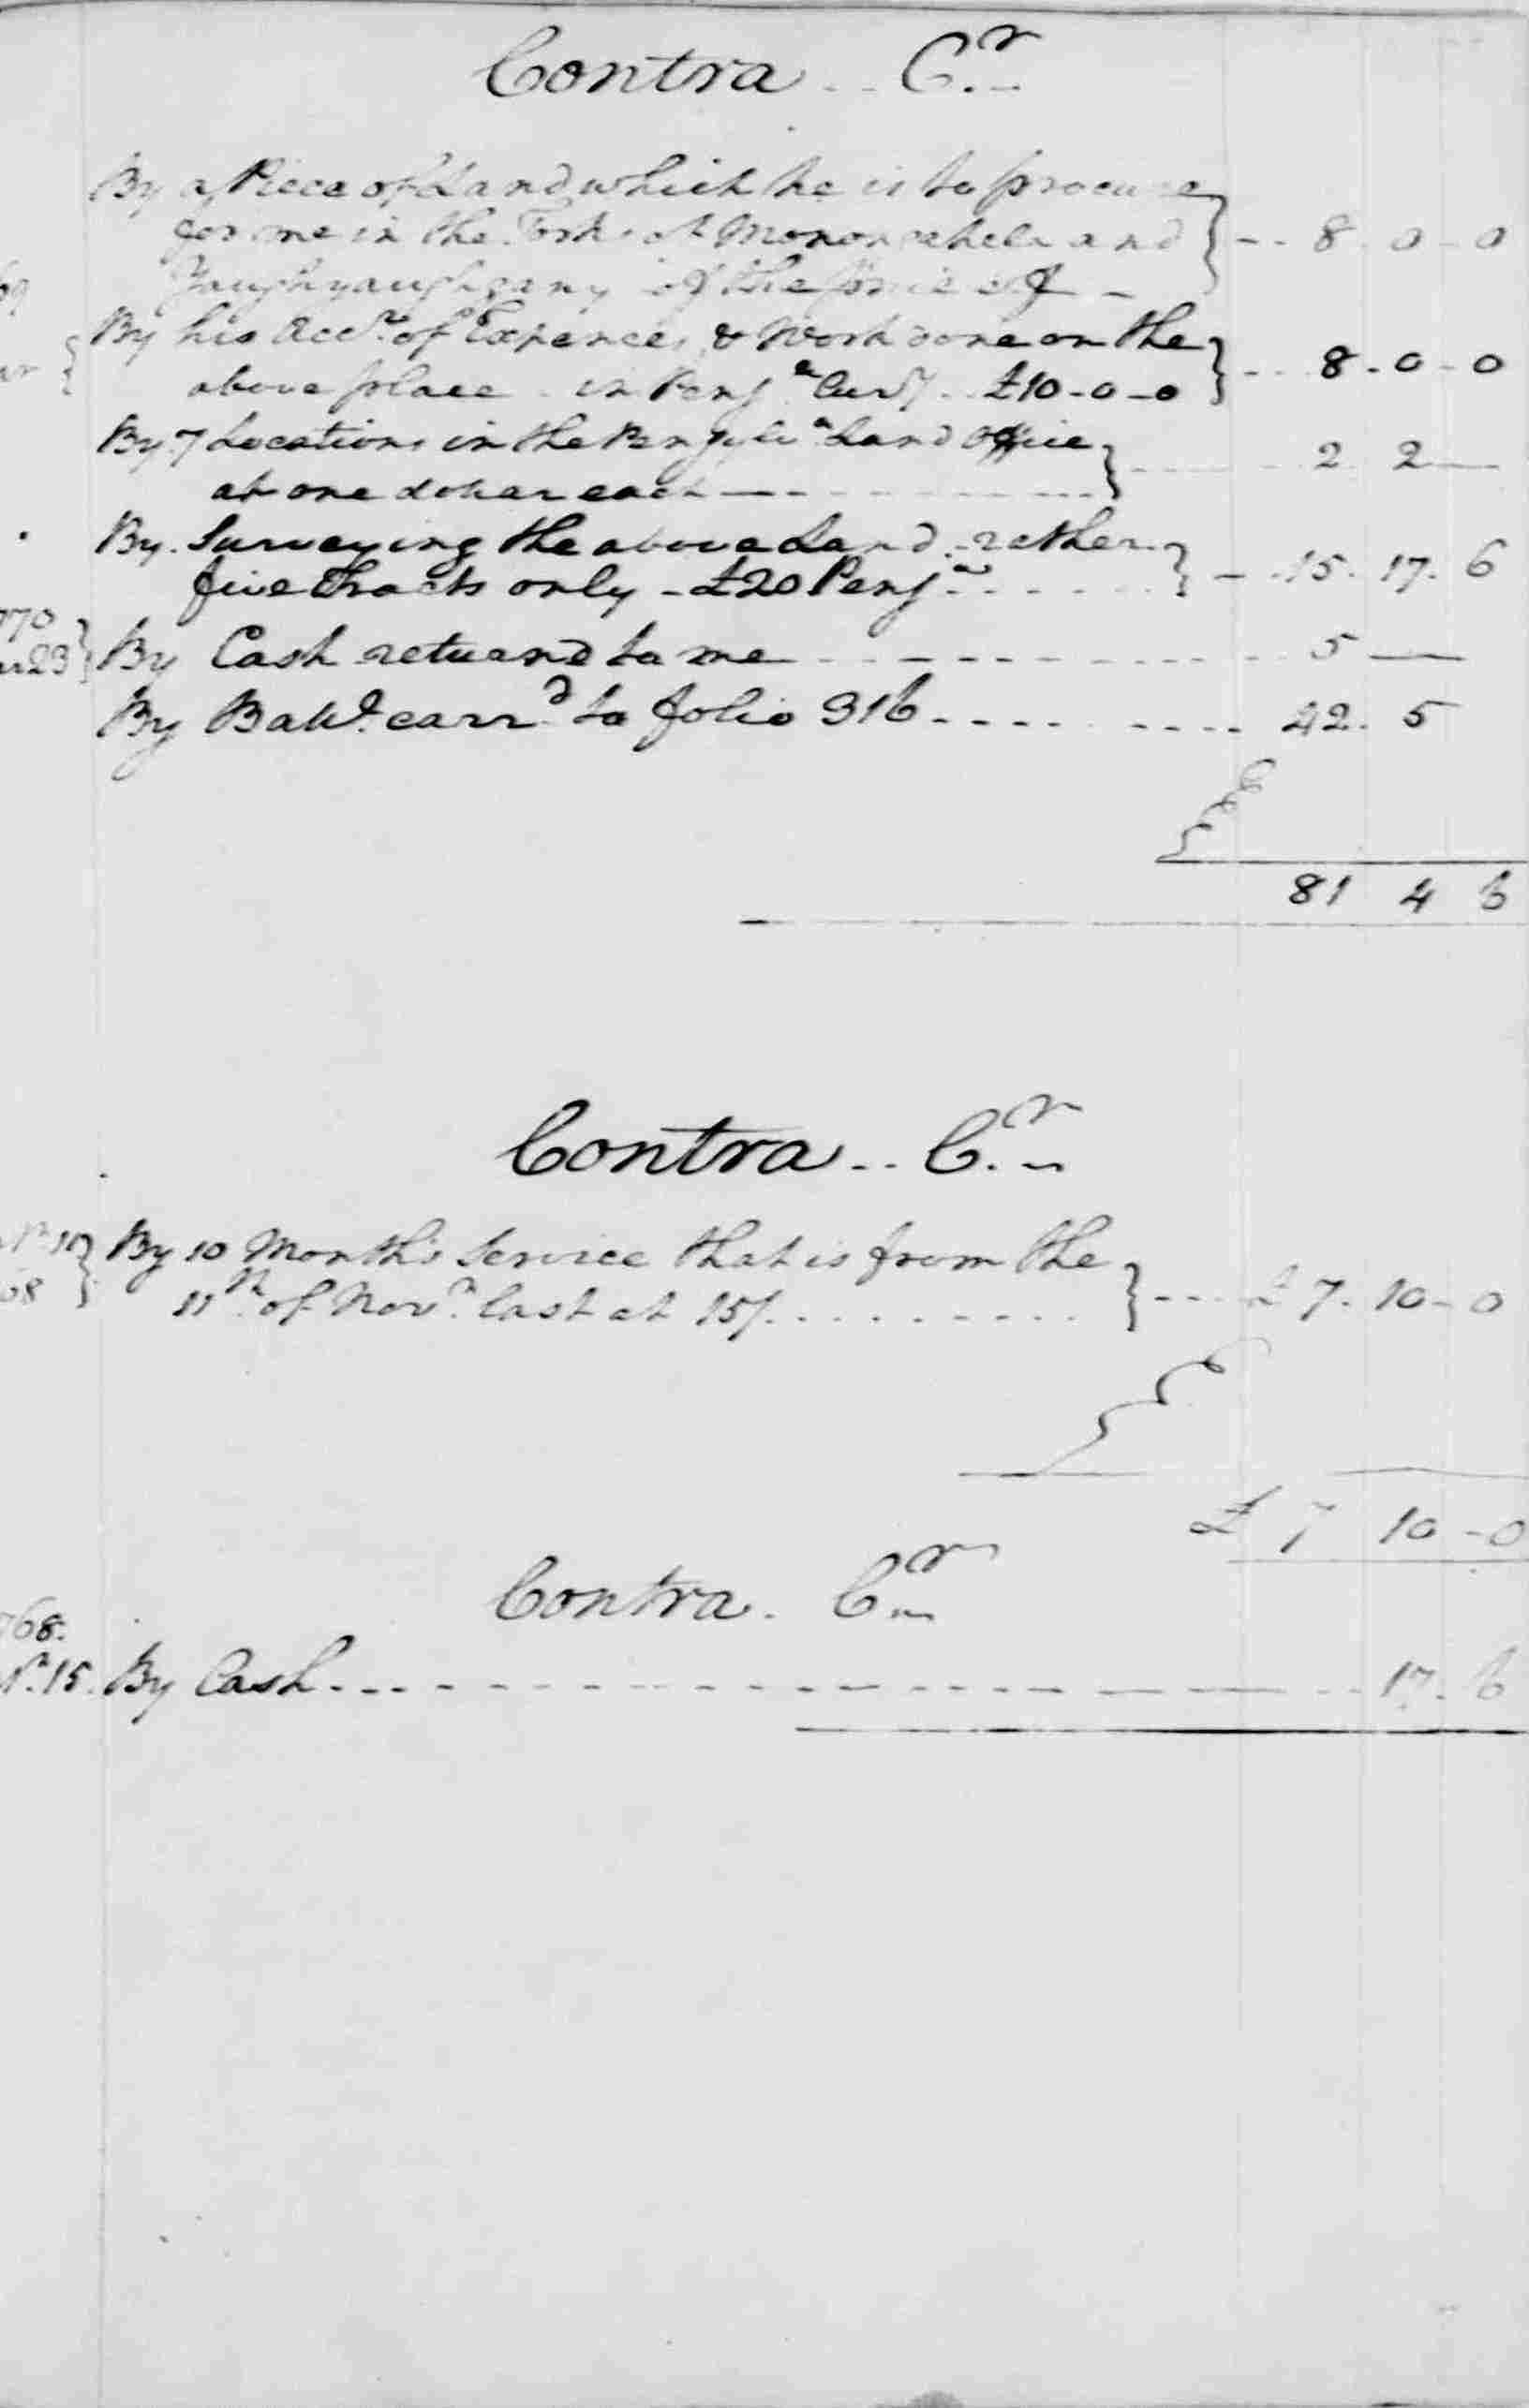 Ledger A, folio 273, right side